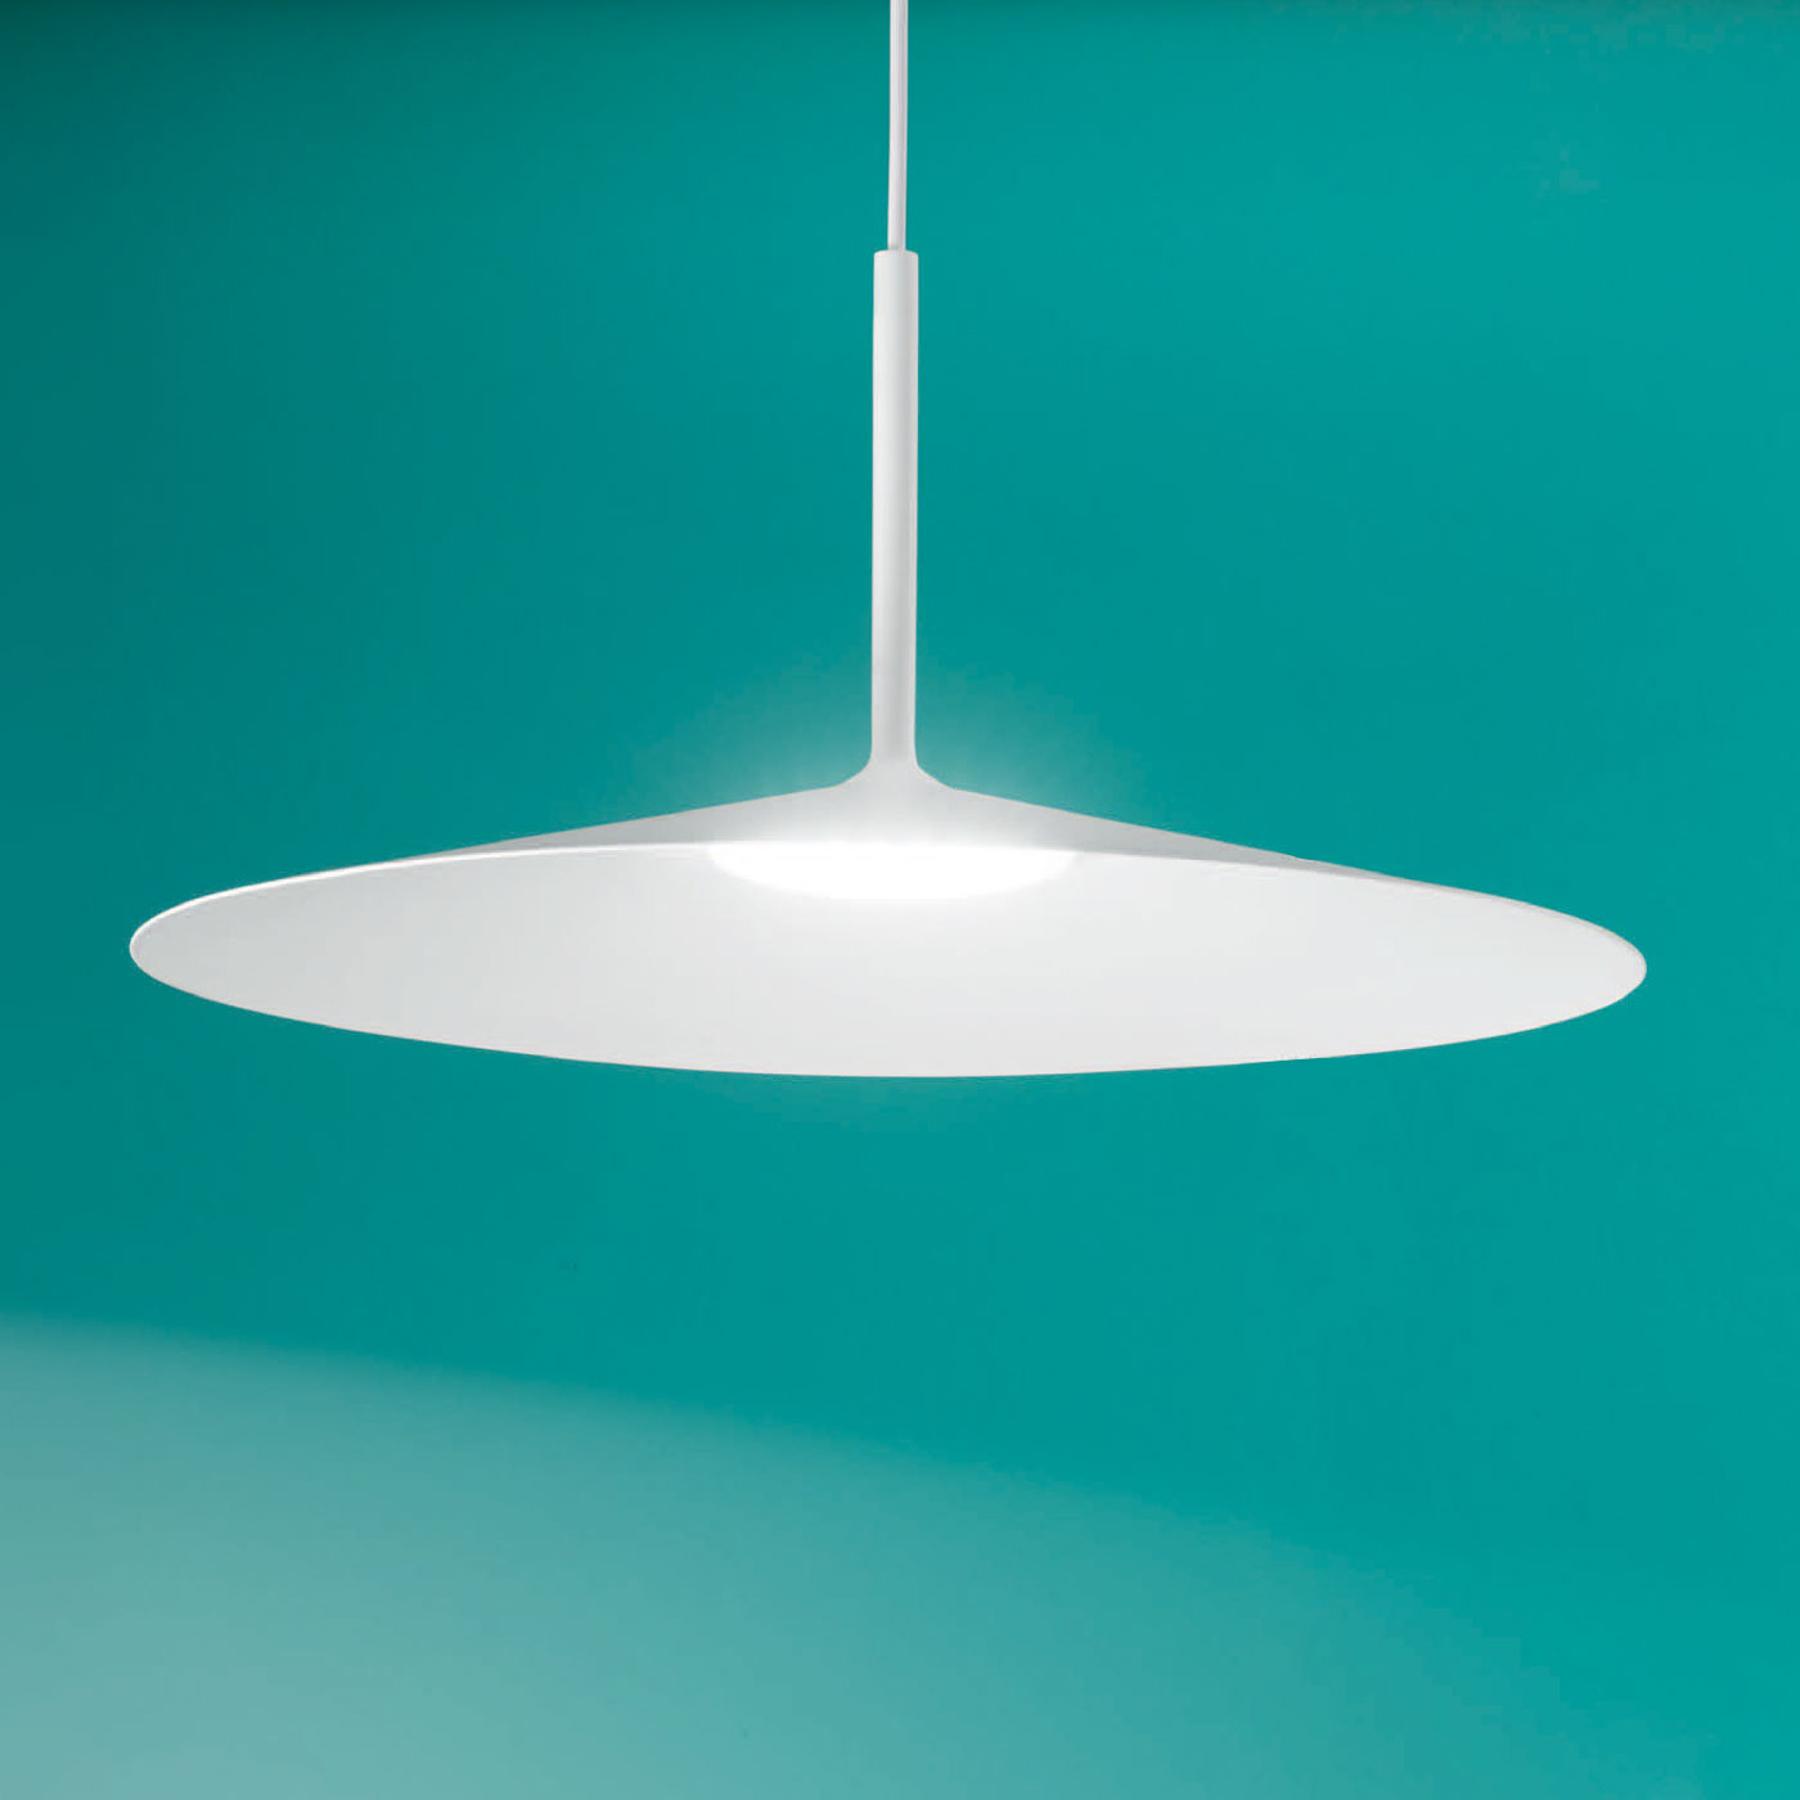 Lampa wisząca LED Poe Plus, biała